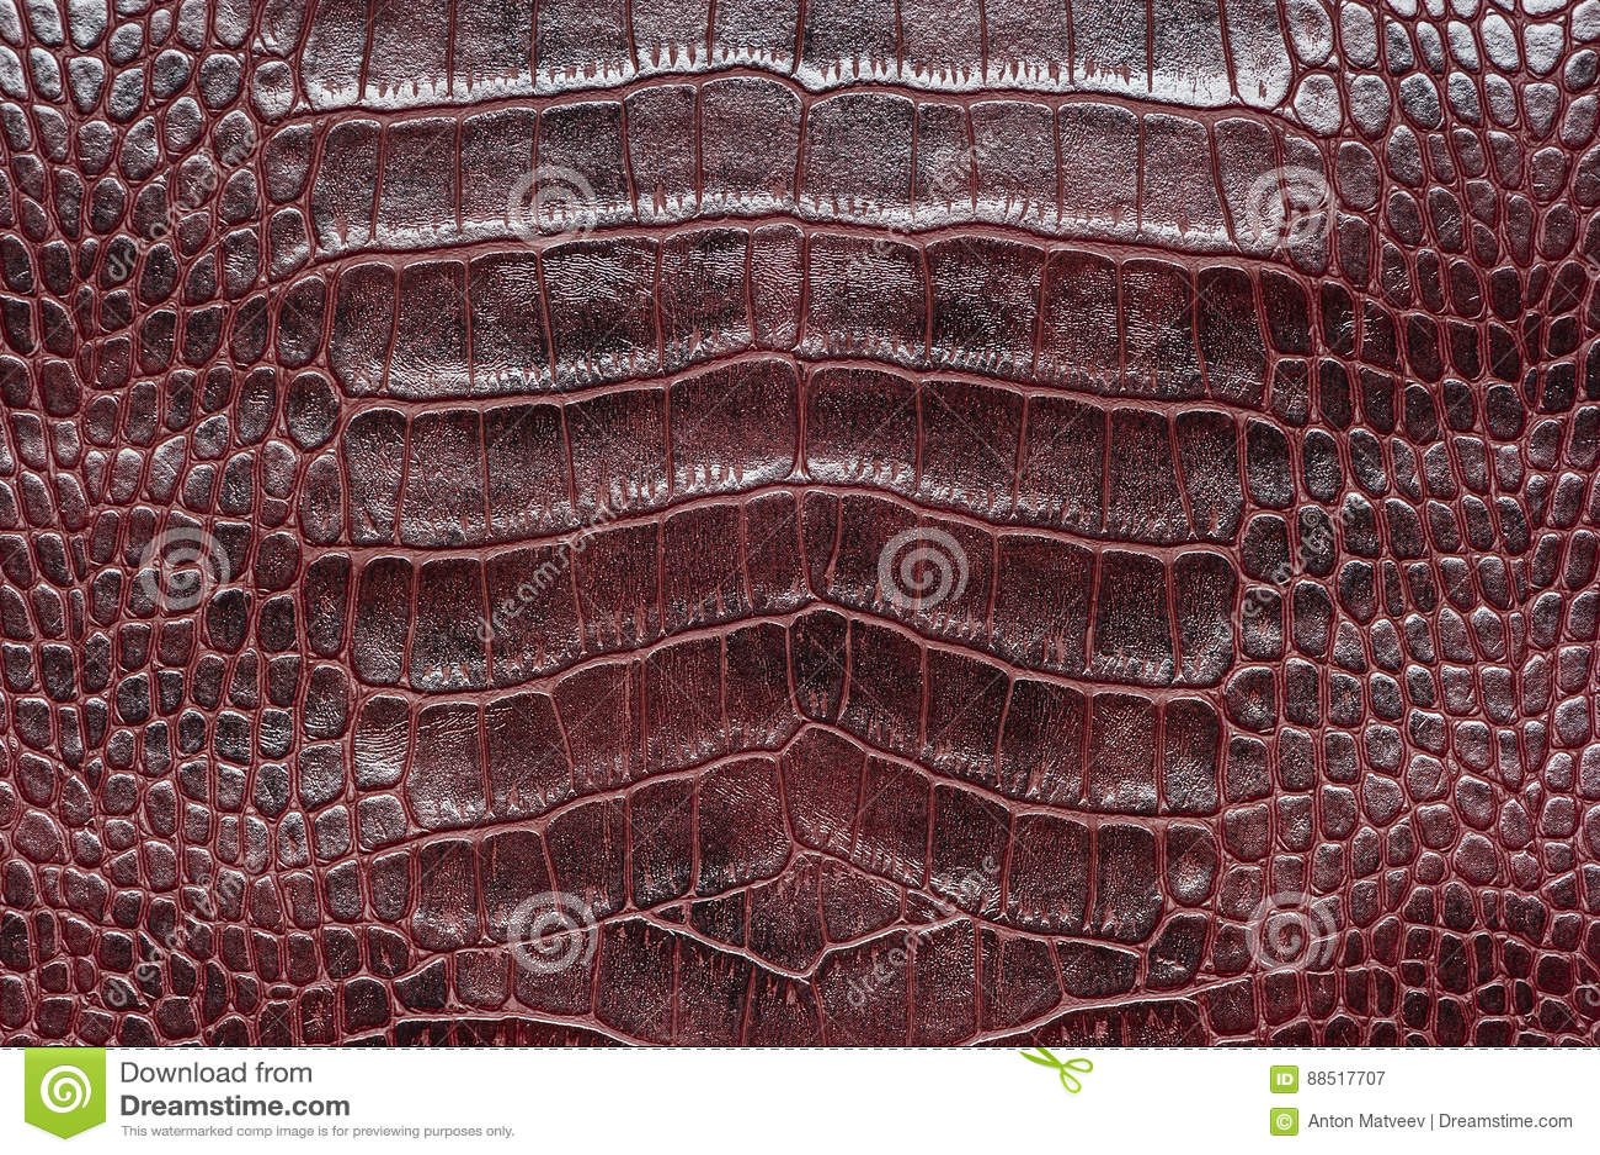 Crocodile leather sample